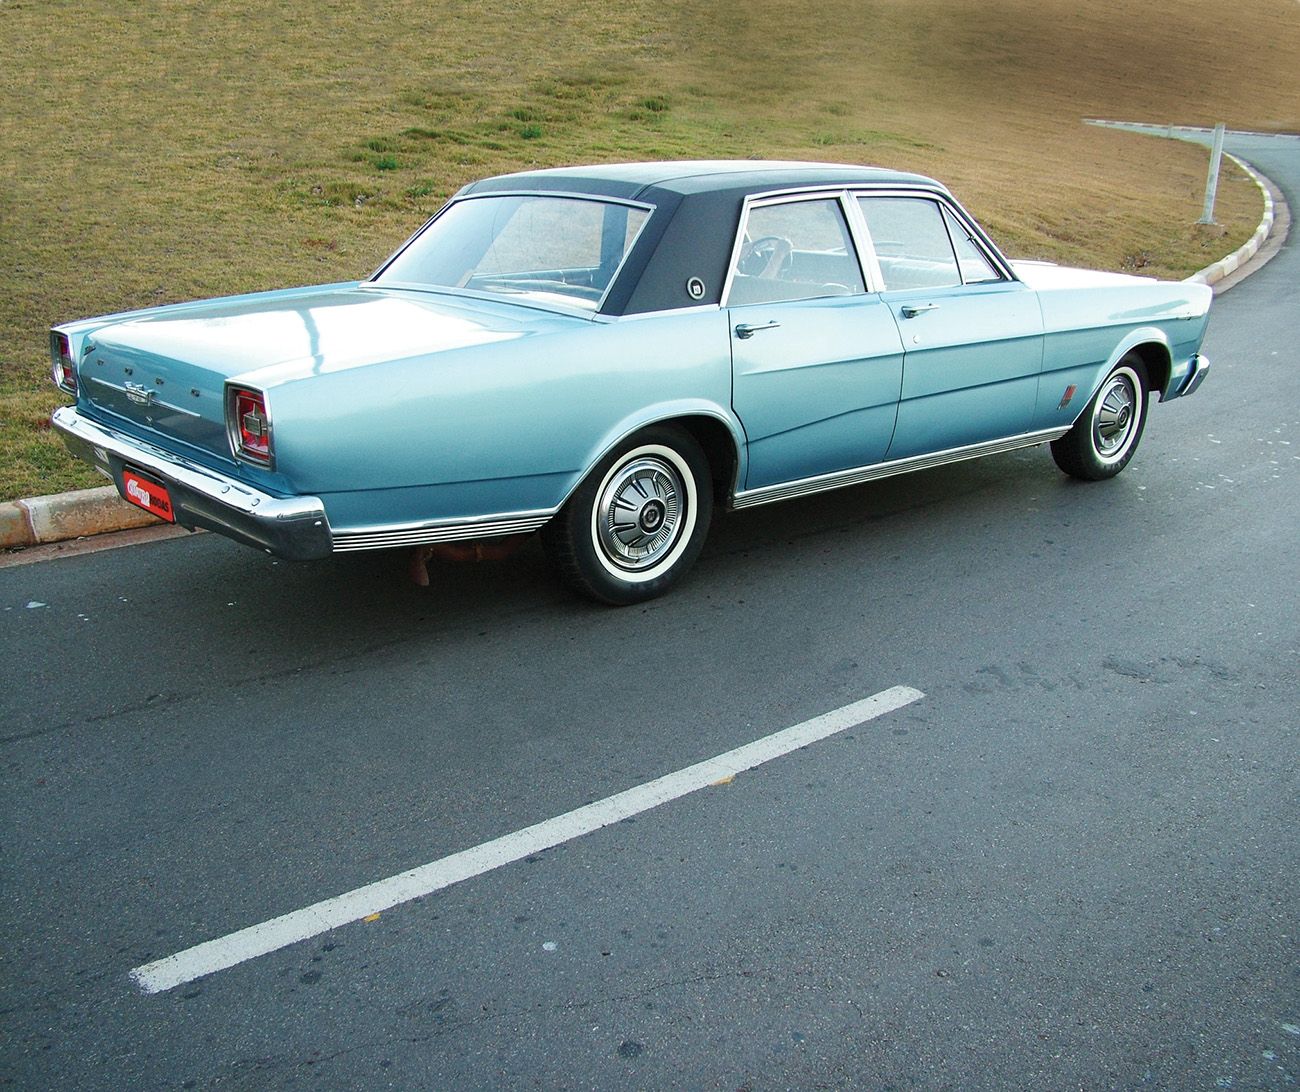 Ford Galaxie LTD